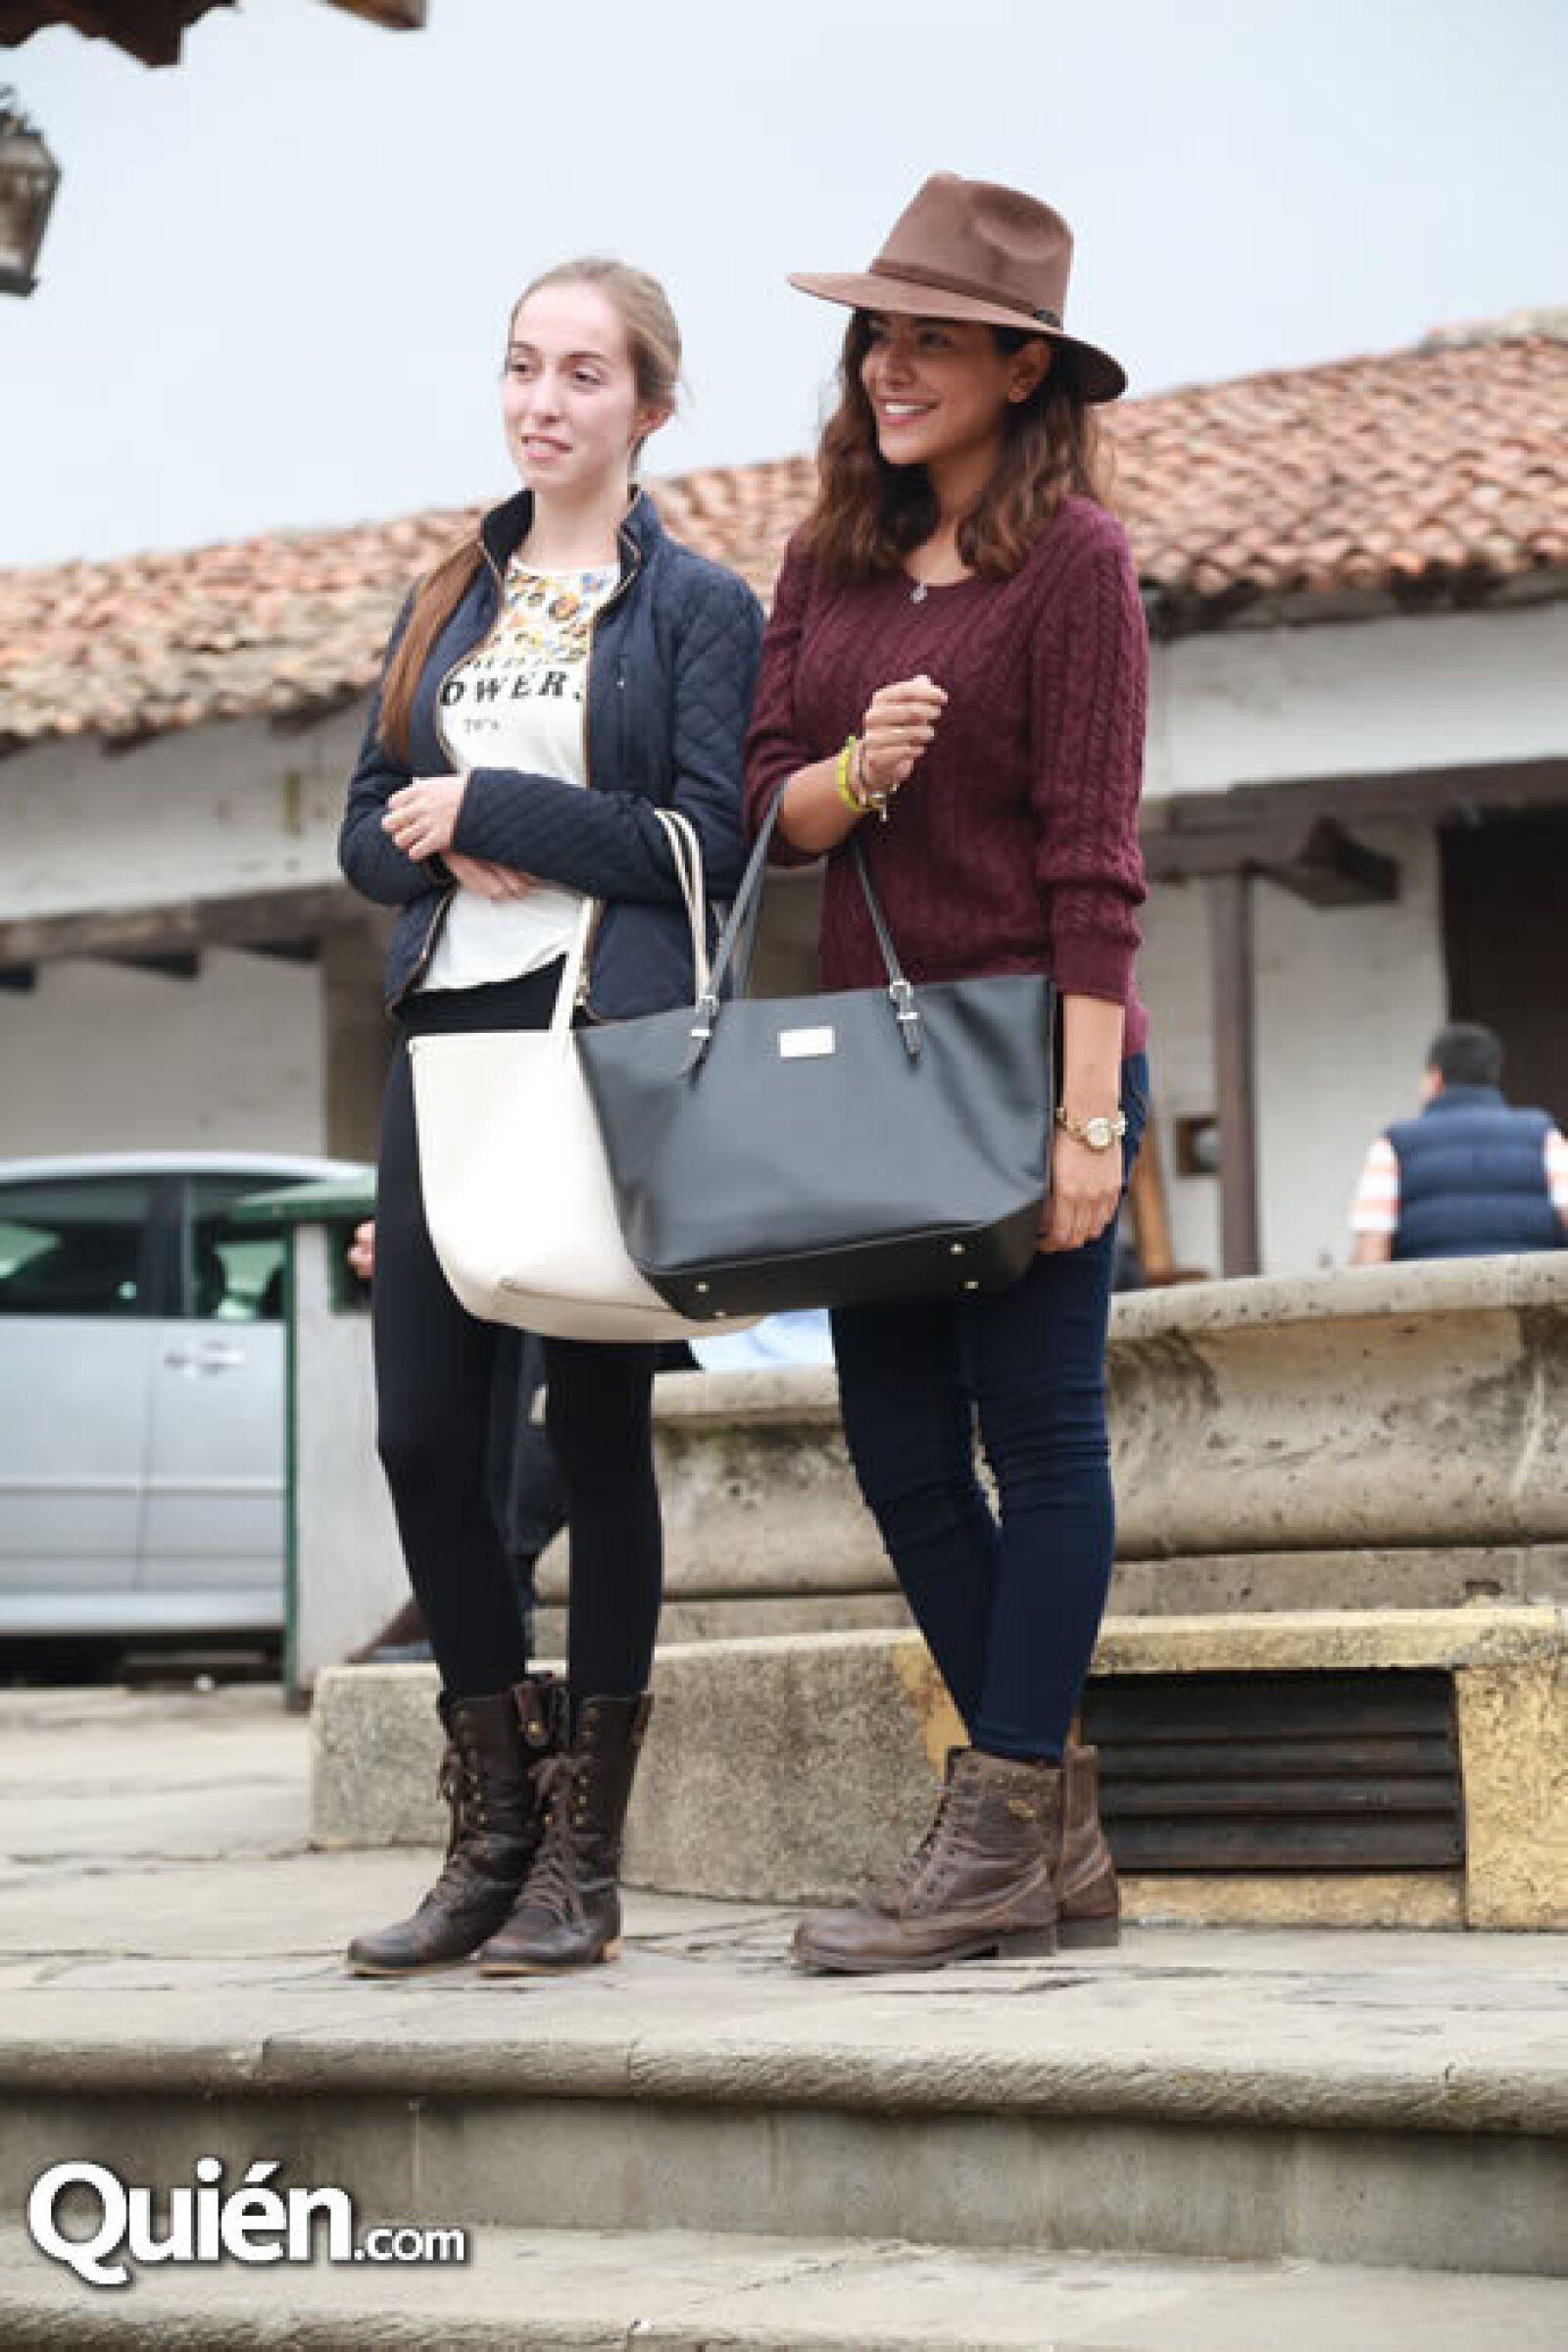 Ana Vélez y Fernanda Castellanos